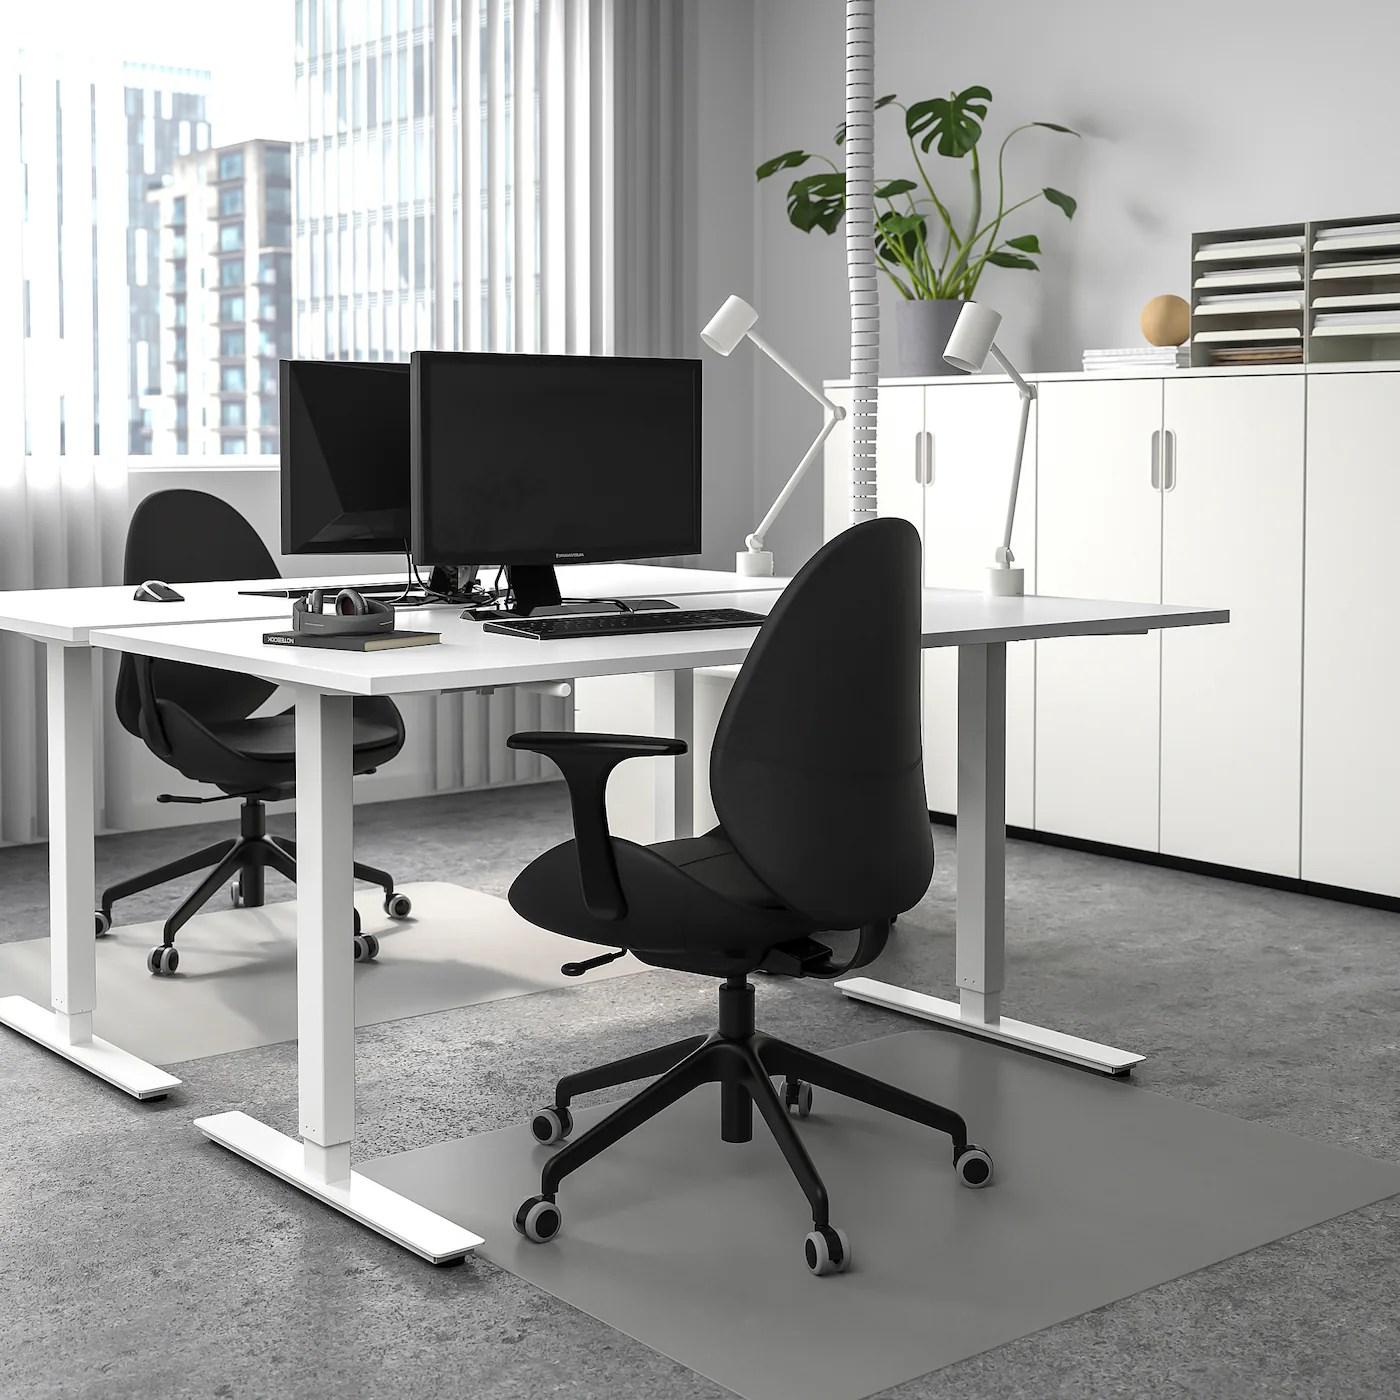 Skarsta Bureau Assis Debout Blanc 160x80 Cm Ikea